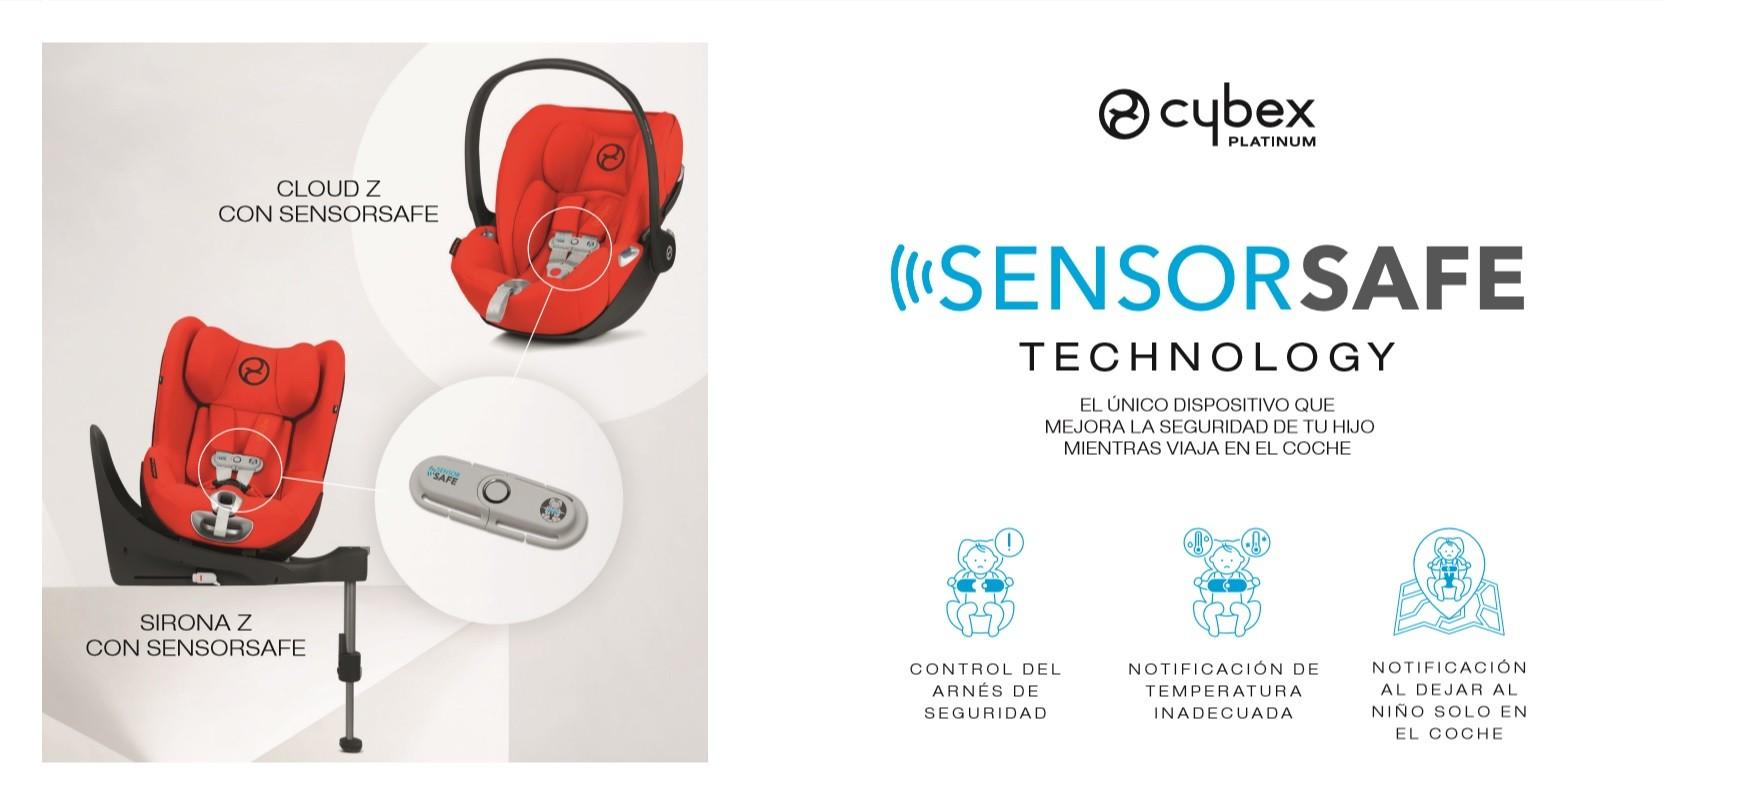 Sensorsafe de Cybex